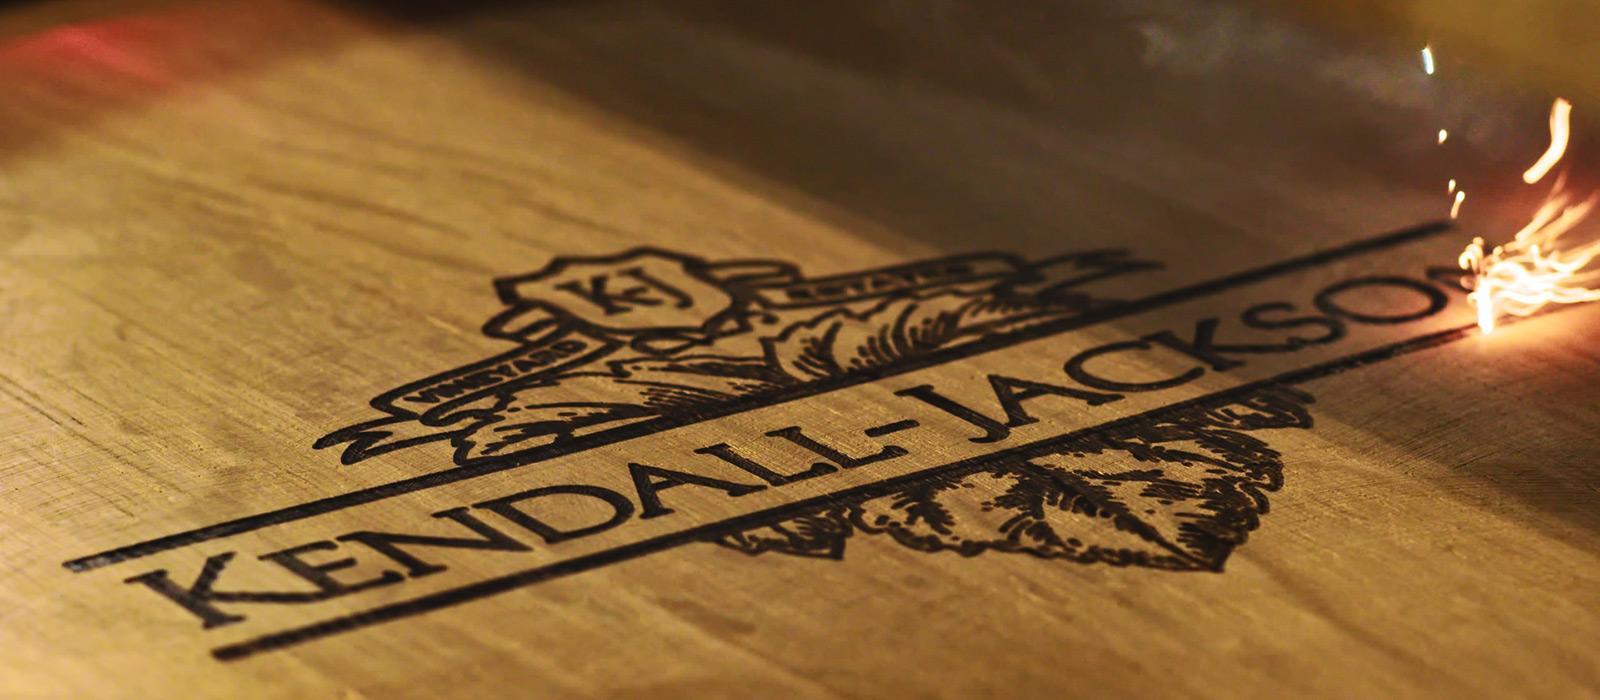 Barrel engraving